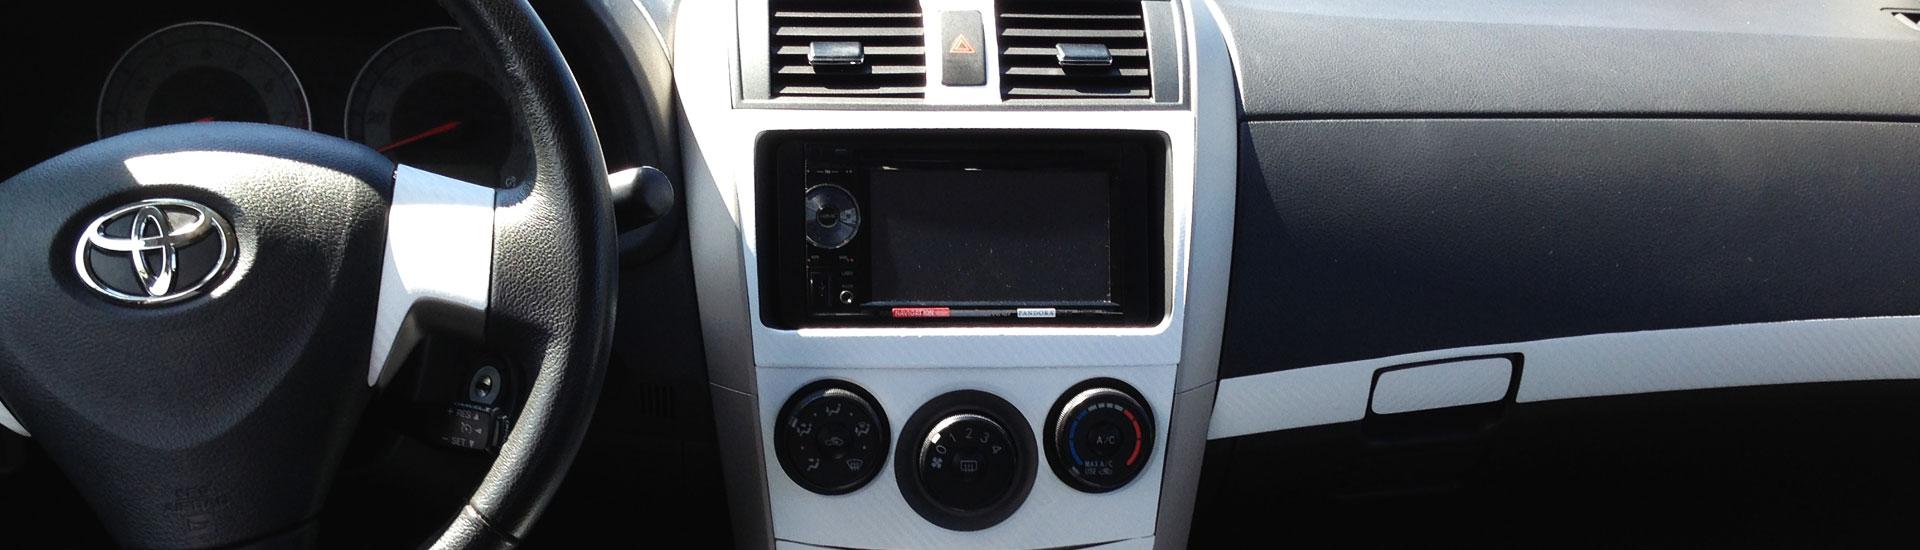 Toyota corolla custom dash kits